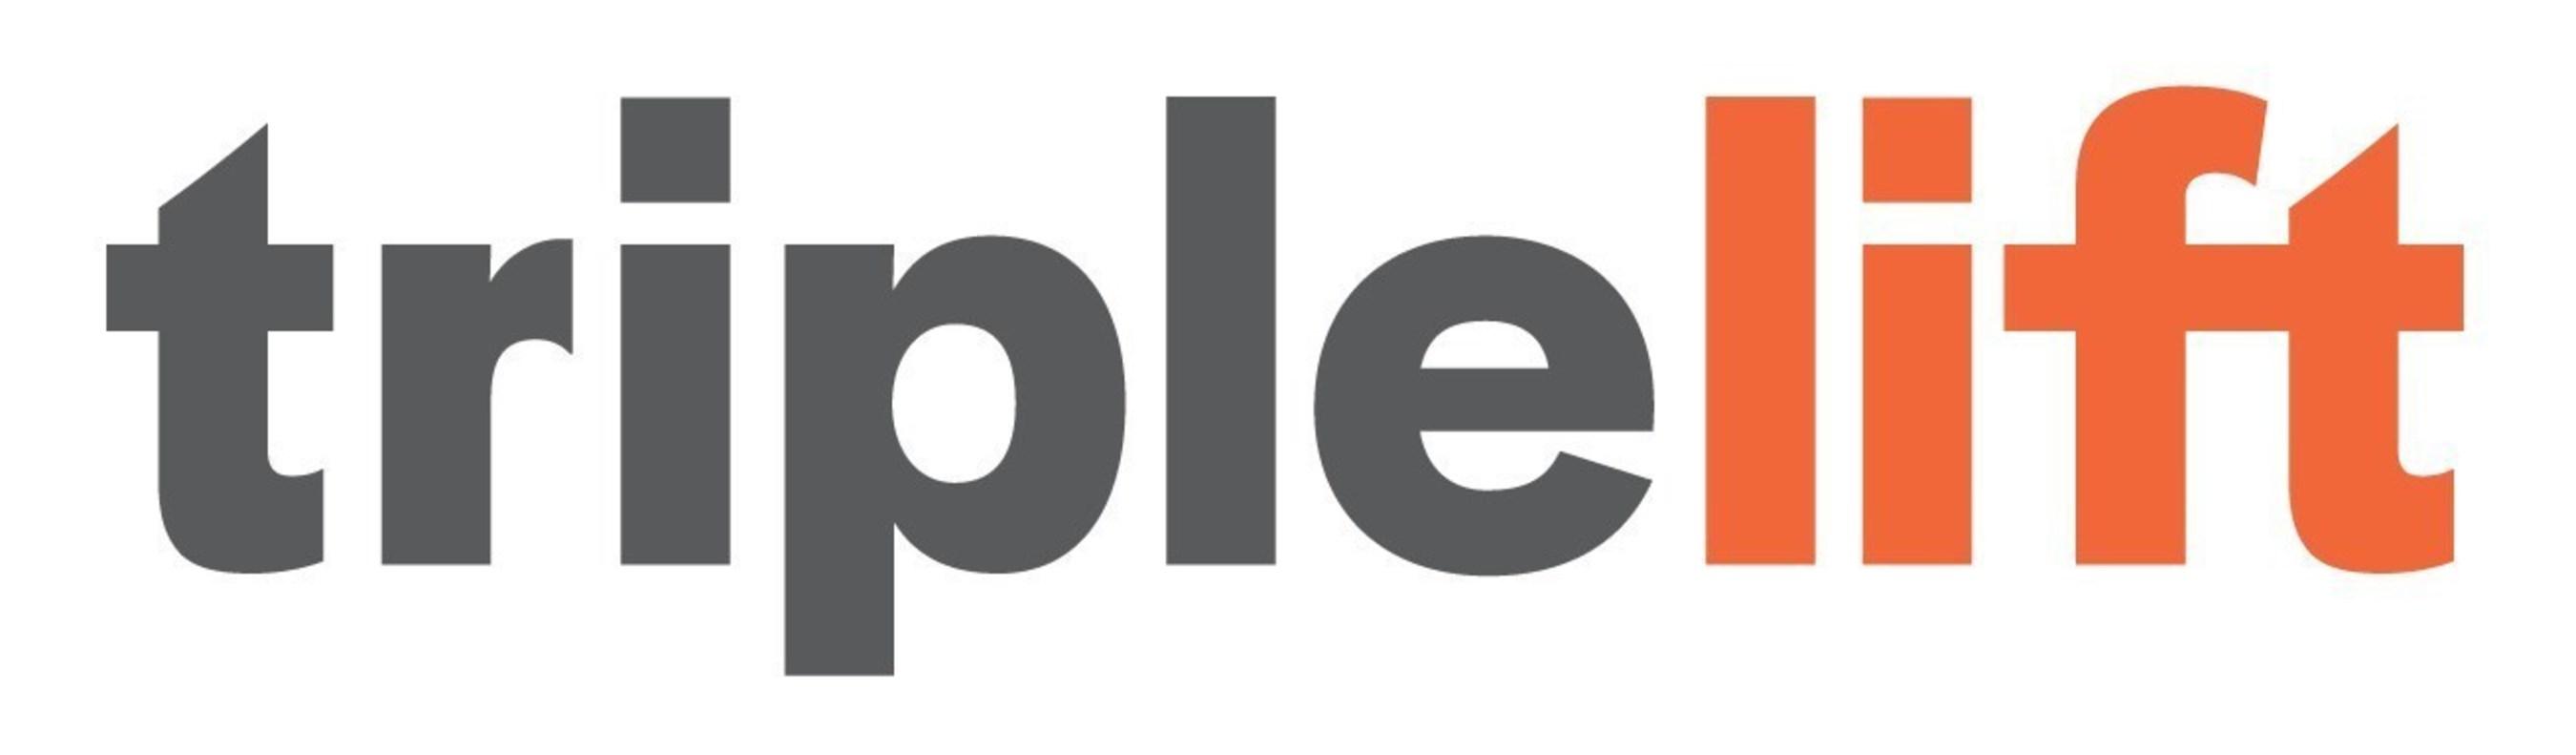 Native Programmatic at Scale (PRNewsFoto/TripleLift)